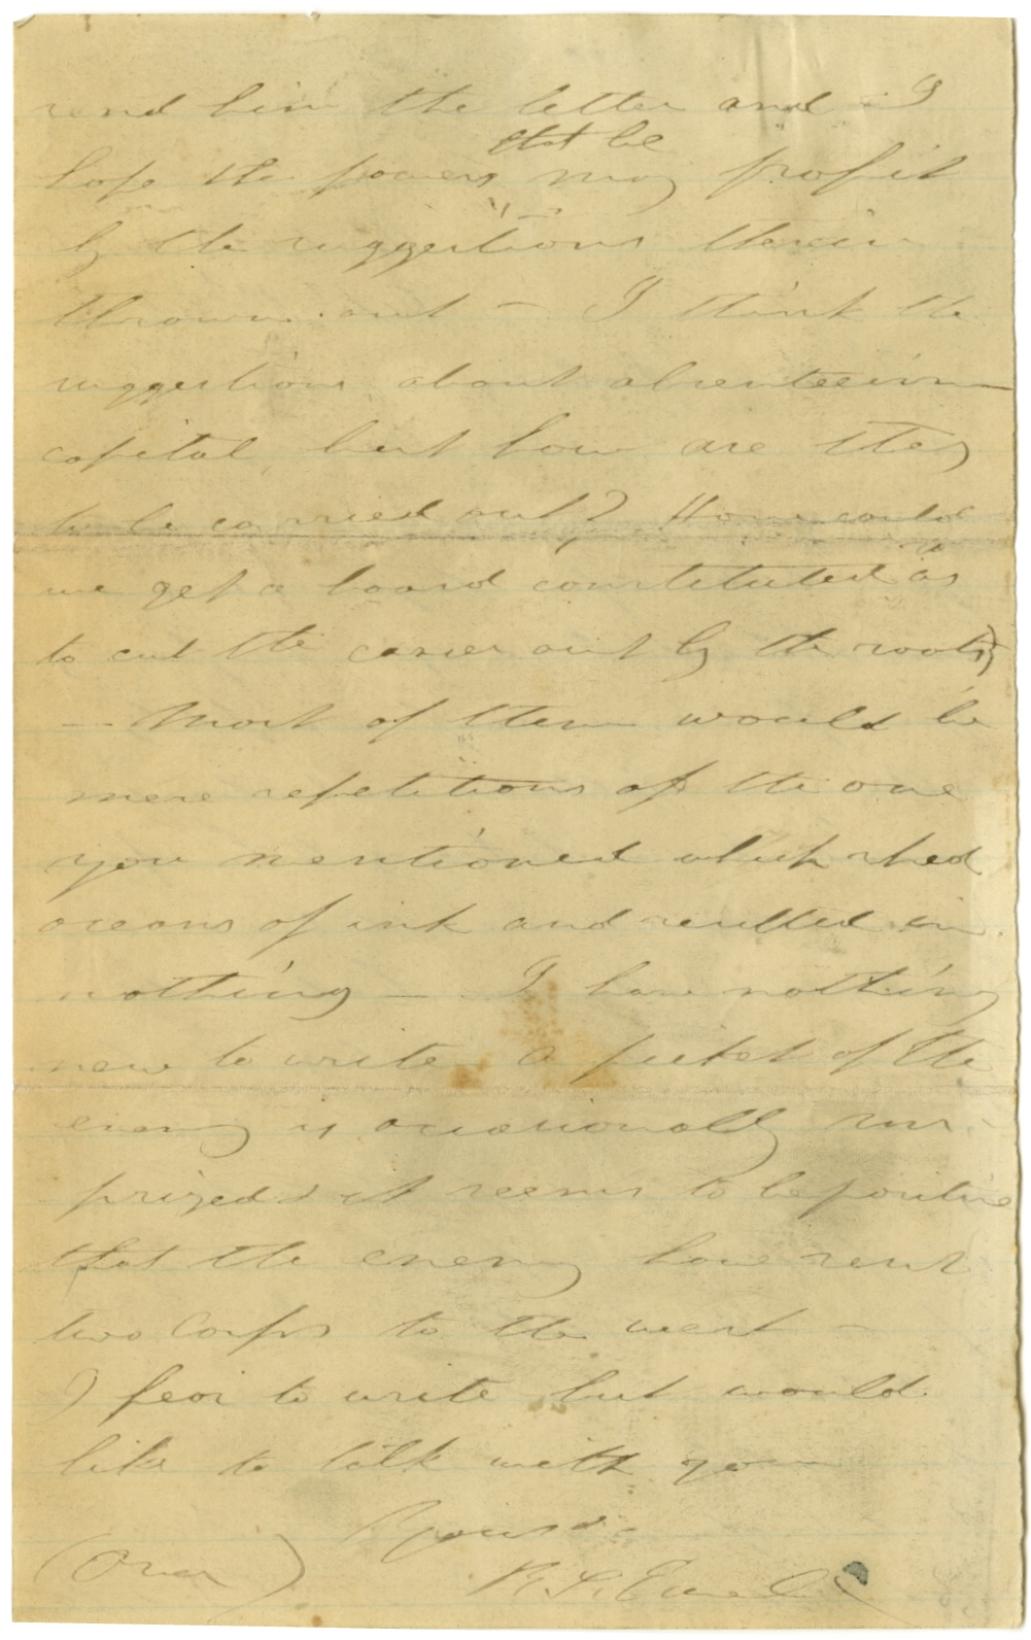 18631001_002